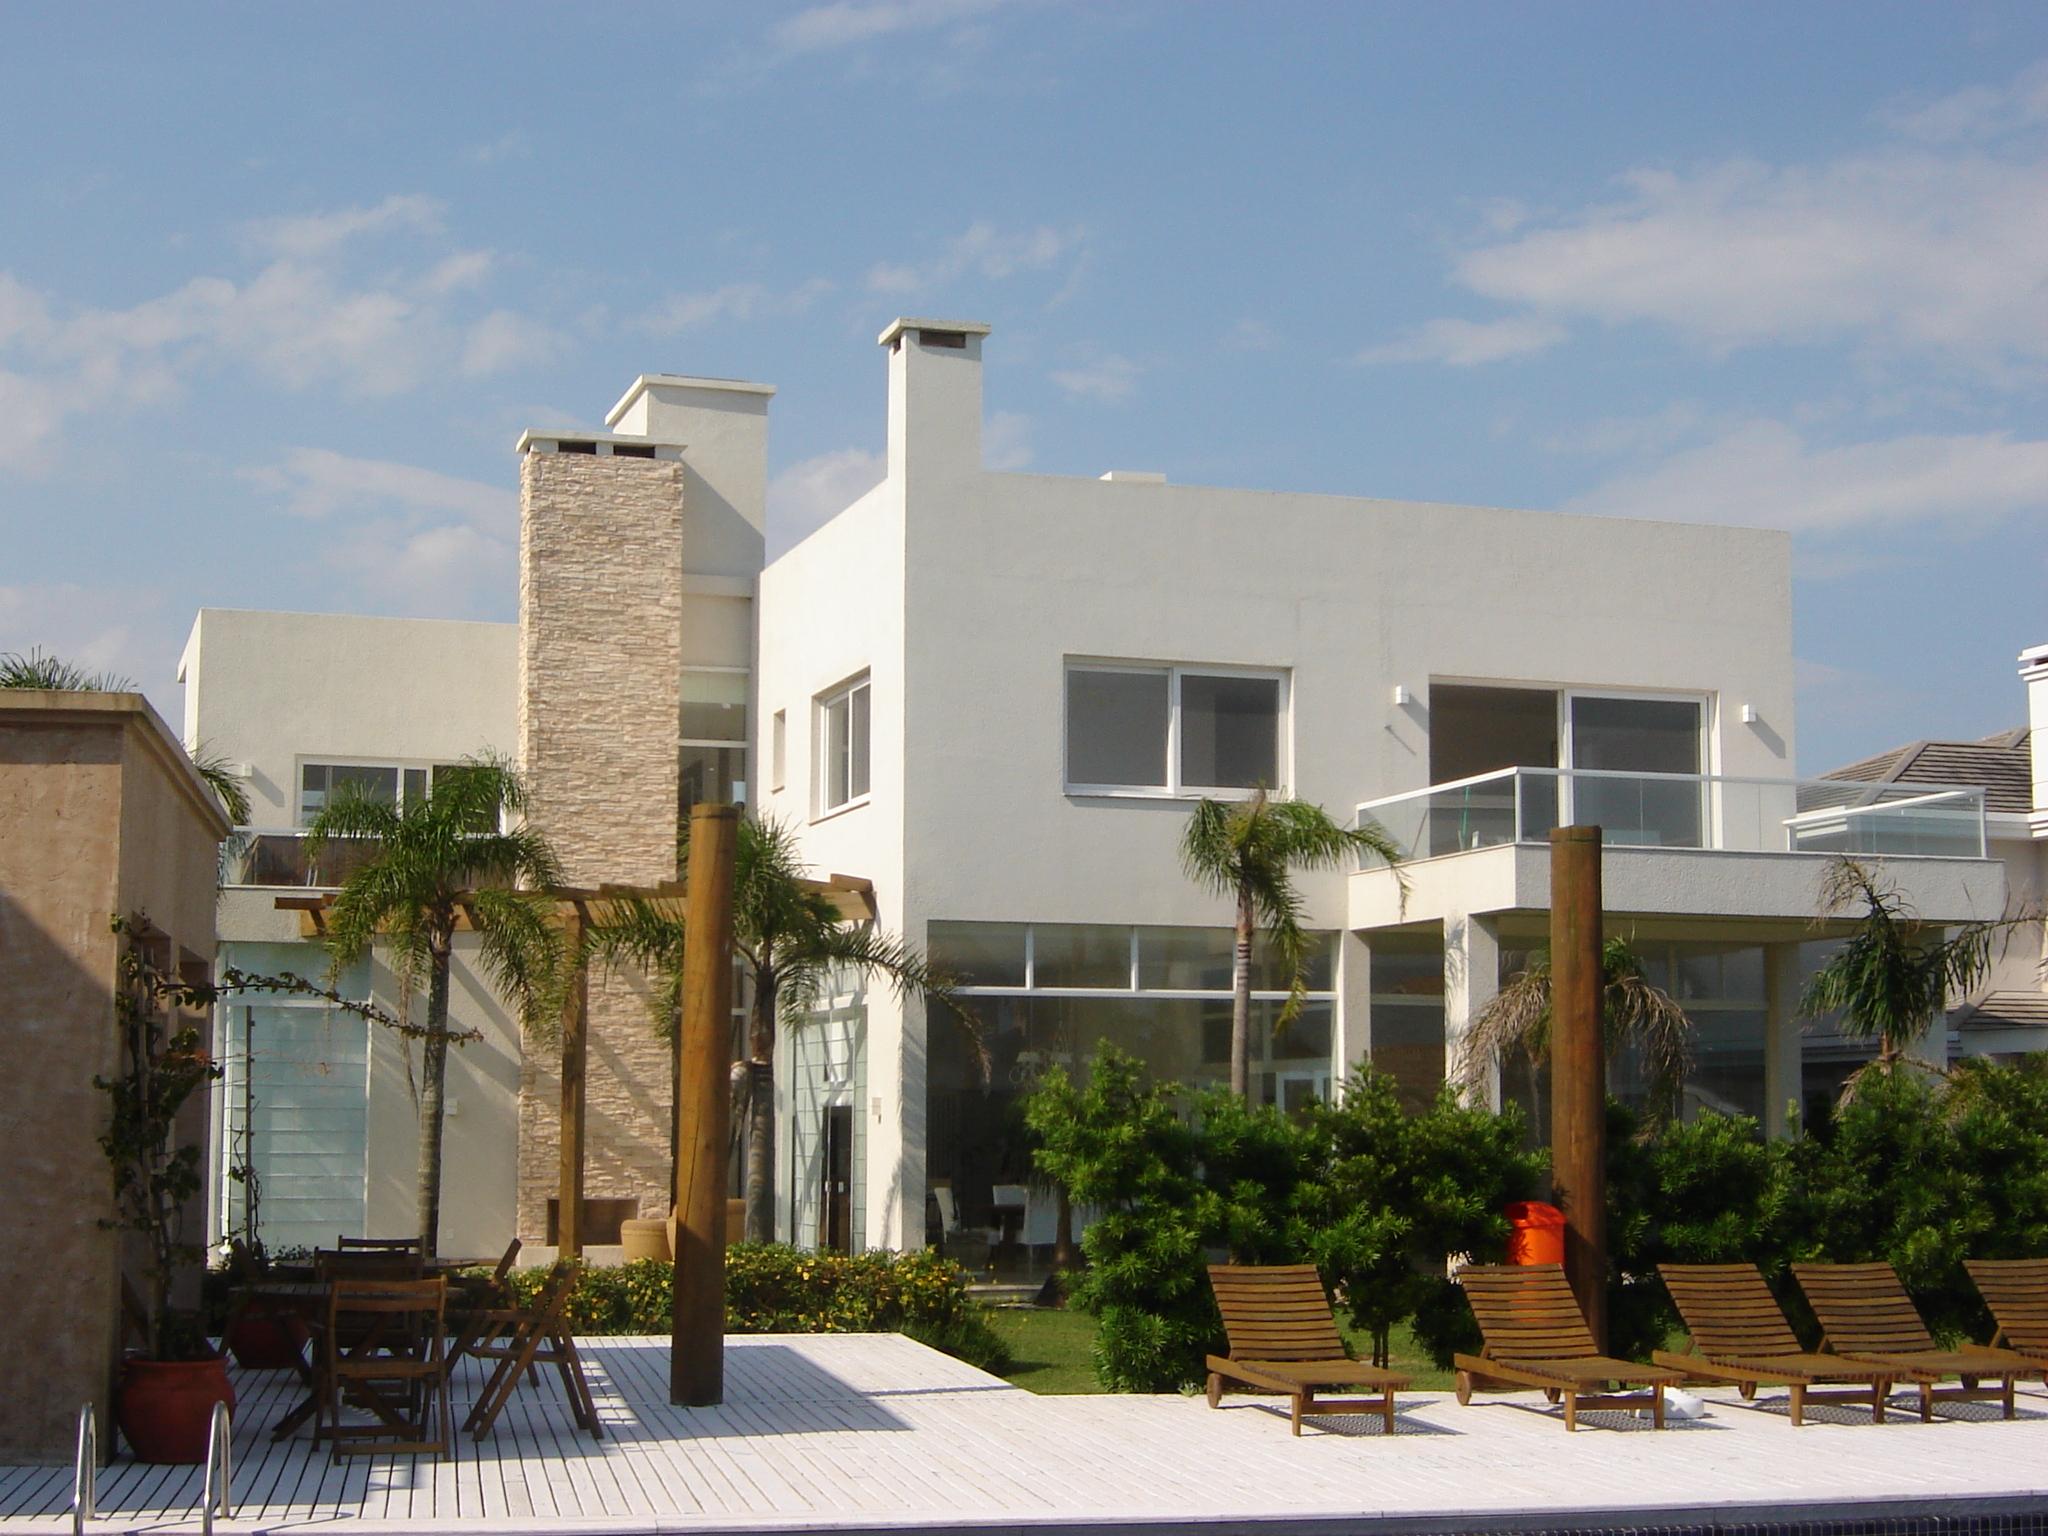 Casa las dunas 05 hinnah dulinski engenharia arquitetura design - Casa las dunas ...